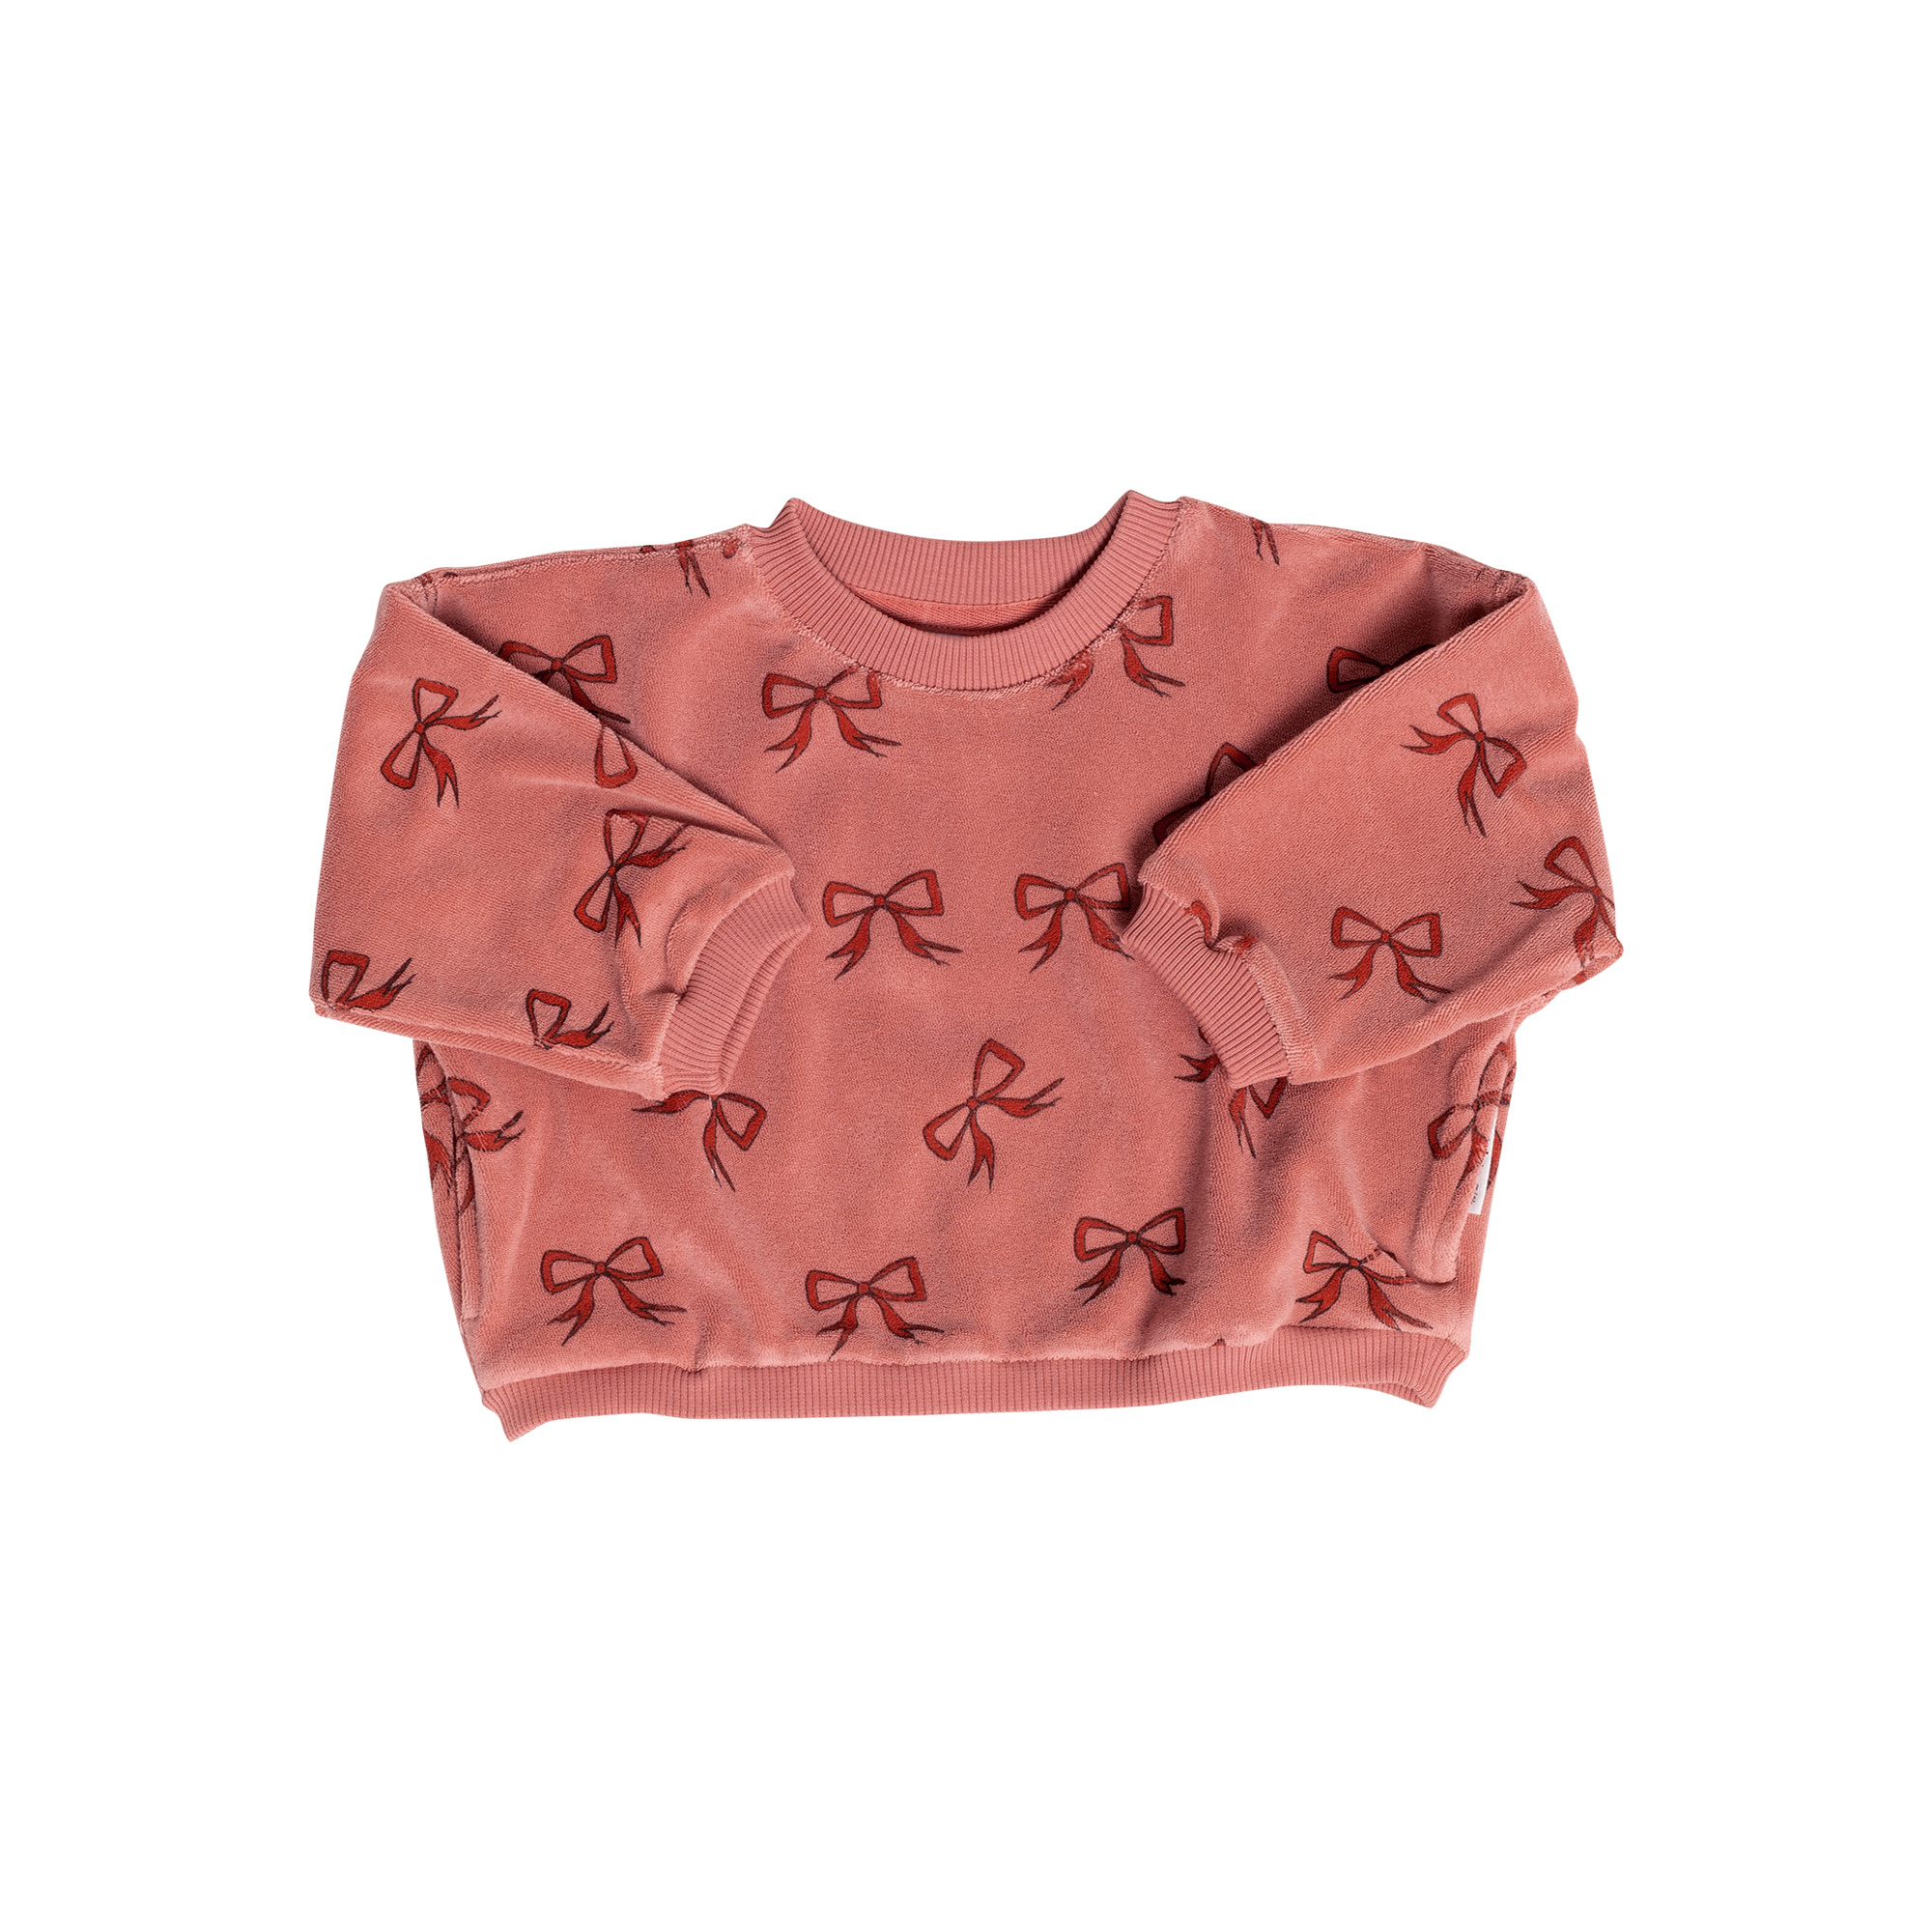 Maed for mini Bow Bandicoot | Sweatshirt